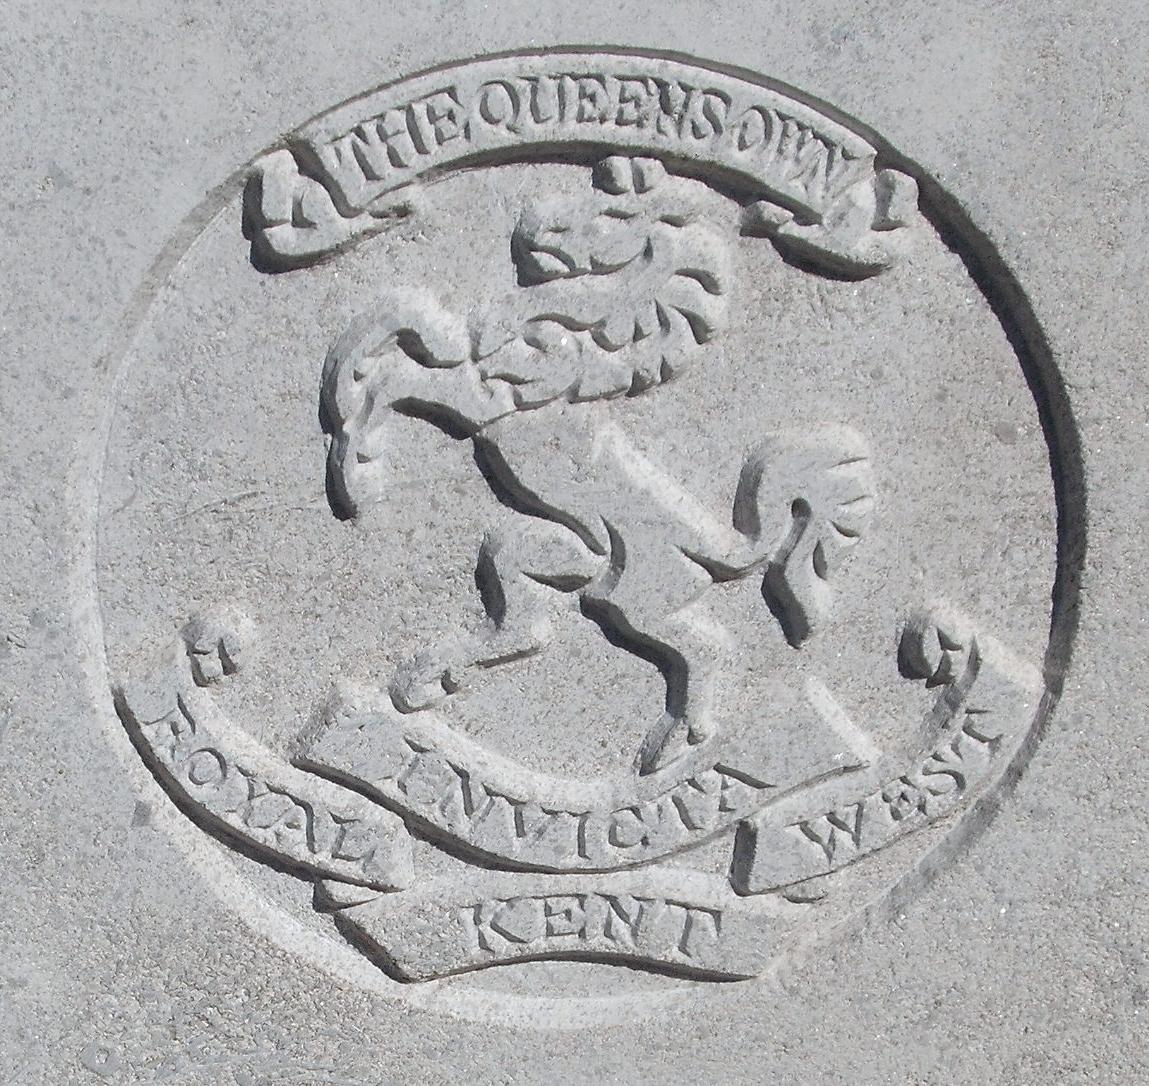 Capbadge of the Royal West Kent Regiment